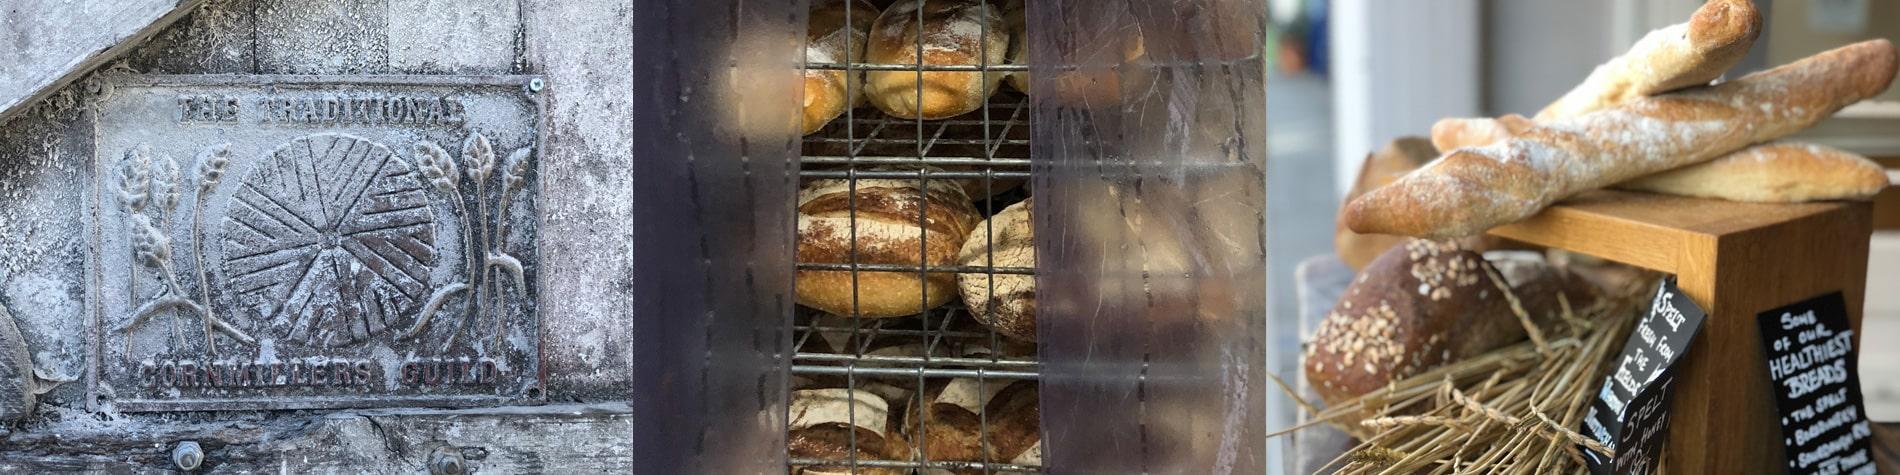 hambleton-bakery_science_cornmiller-guild.jpg